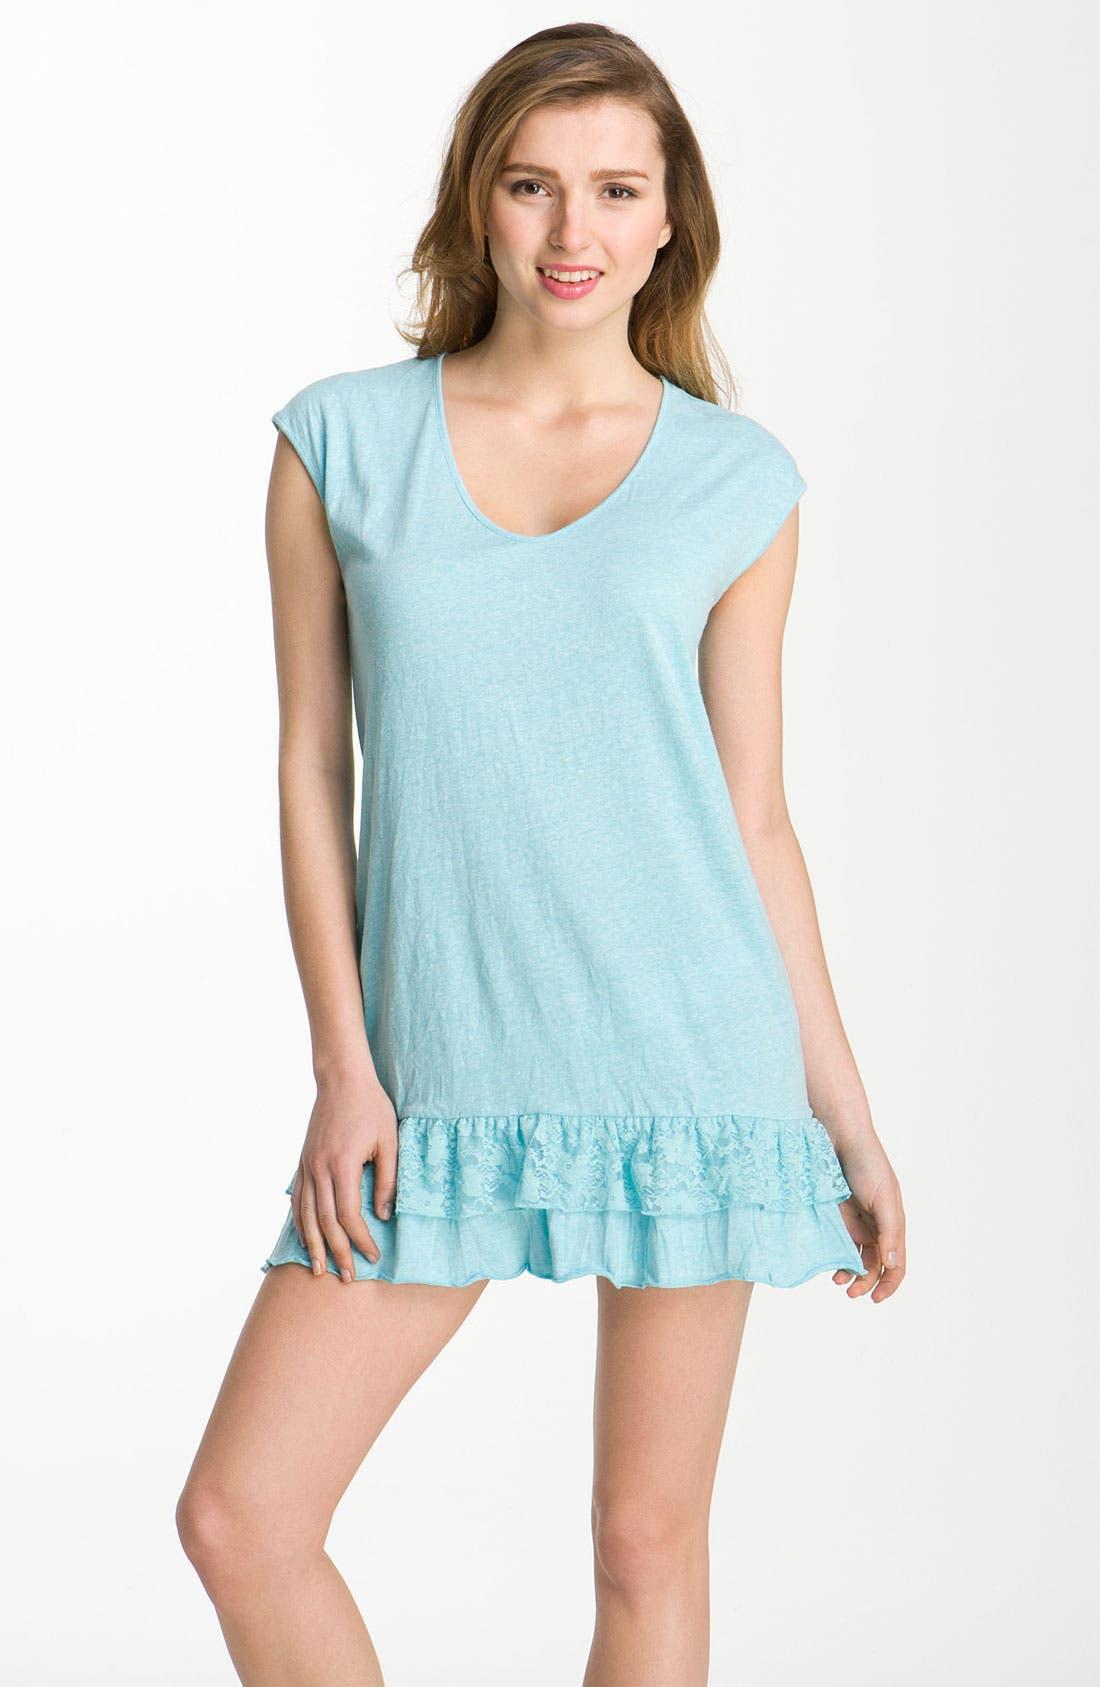 Main Image - Make + Model 'Frou Frou' Sleep Shirt